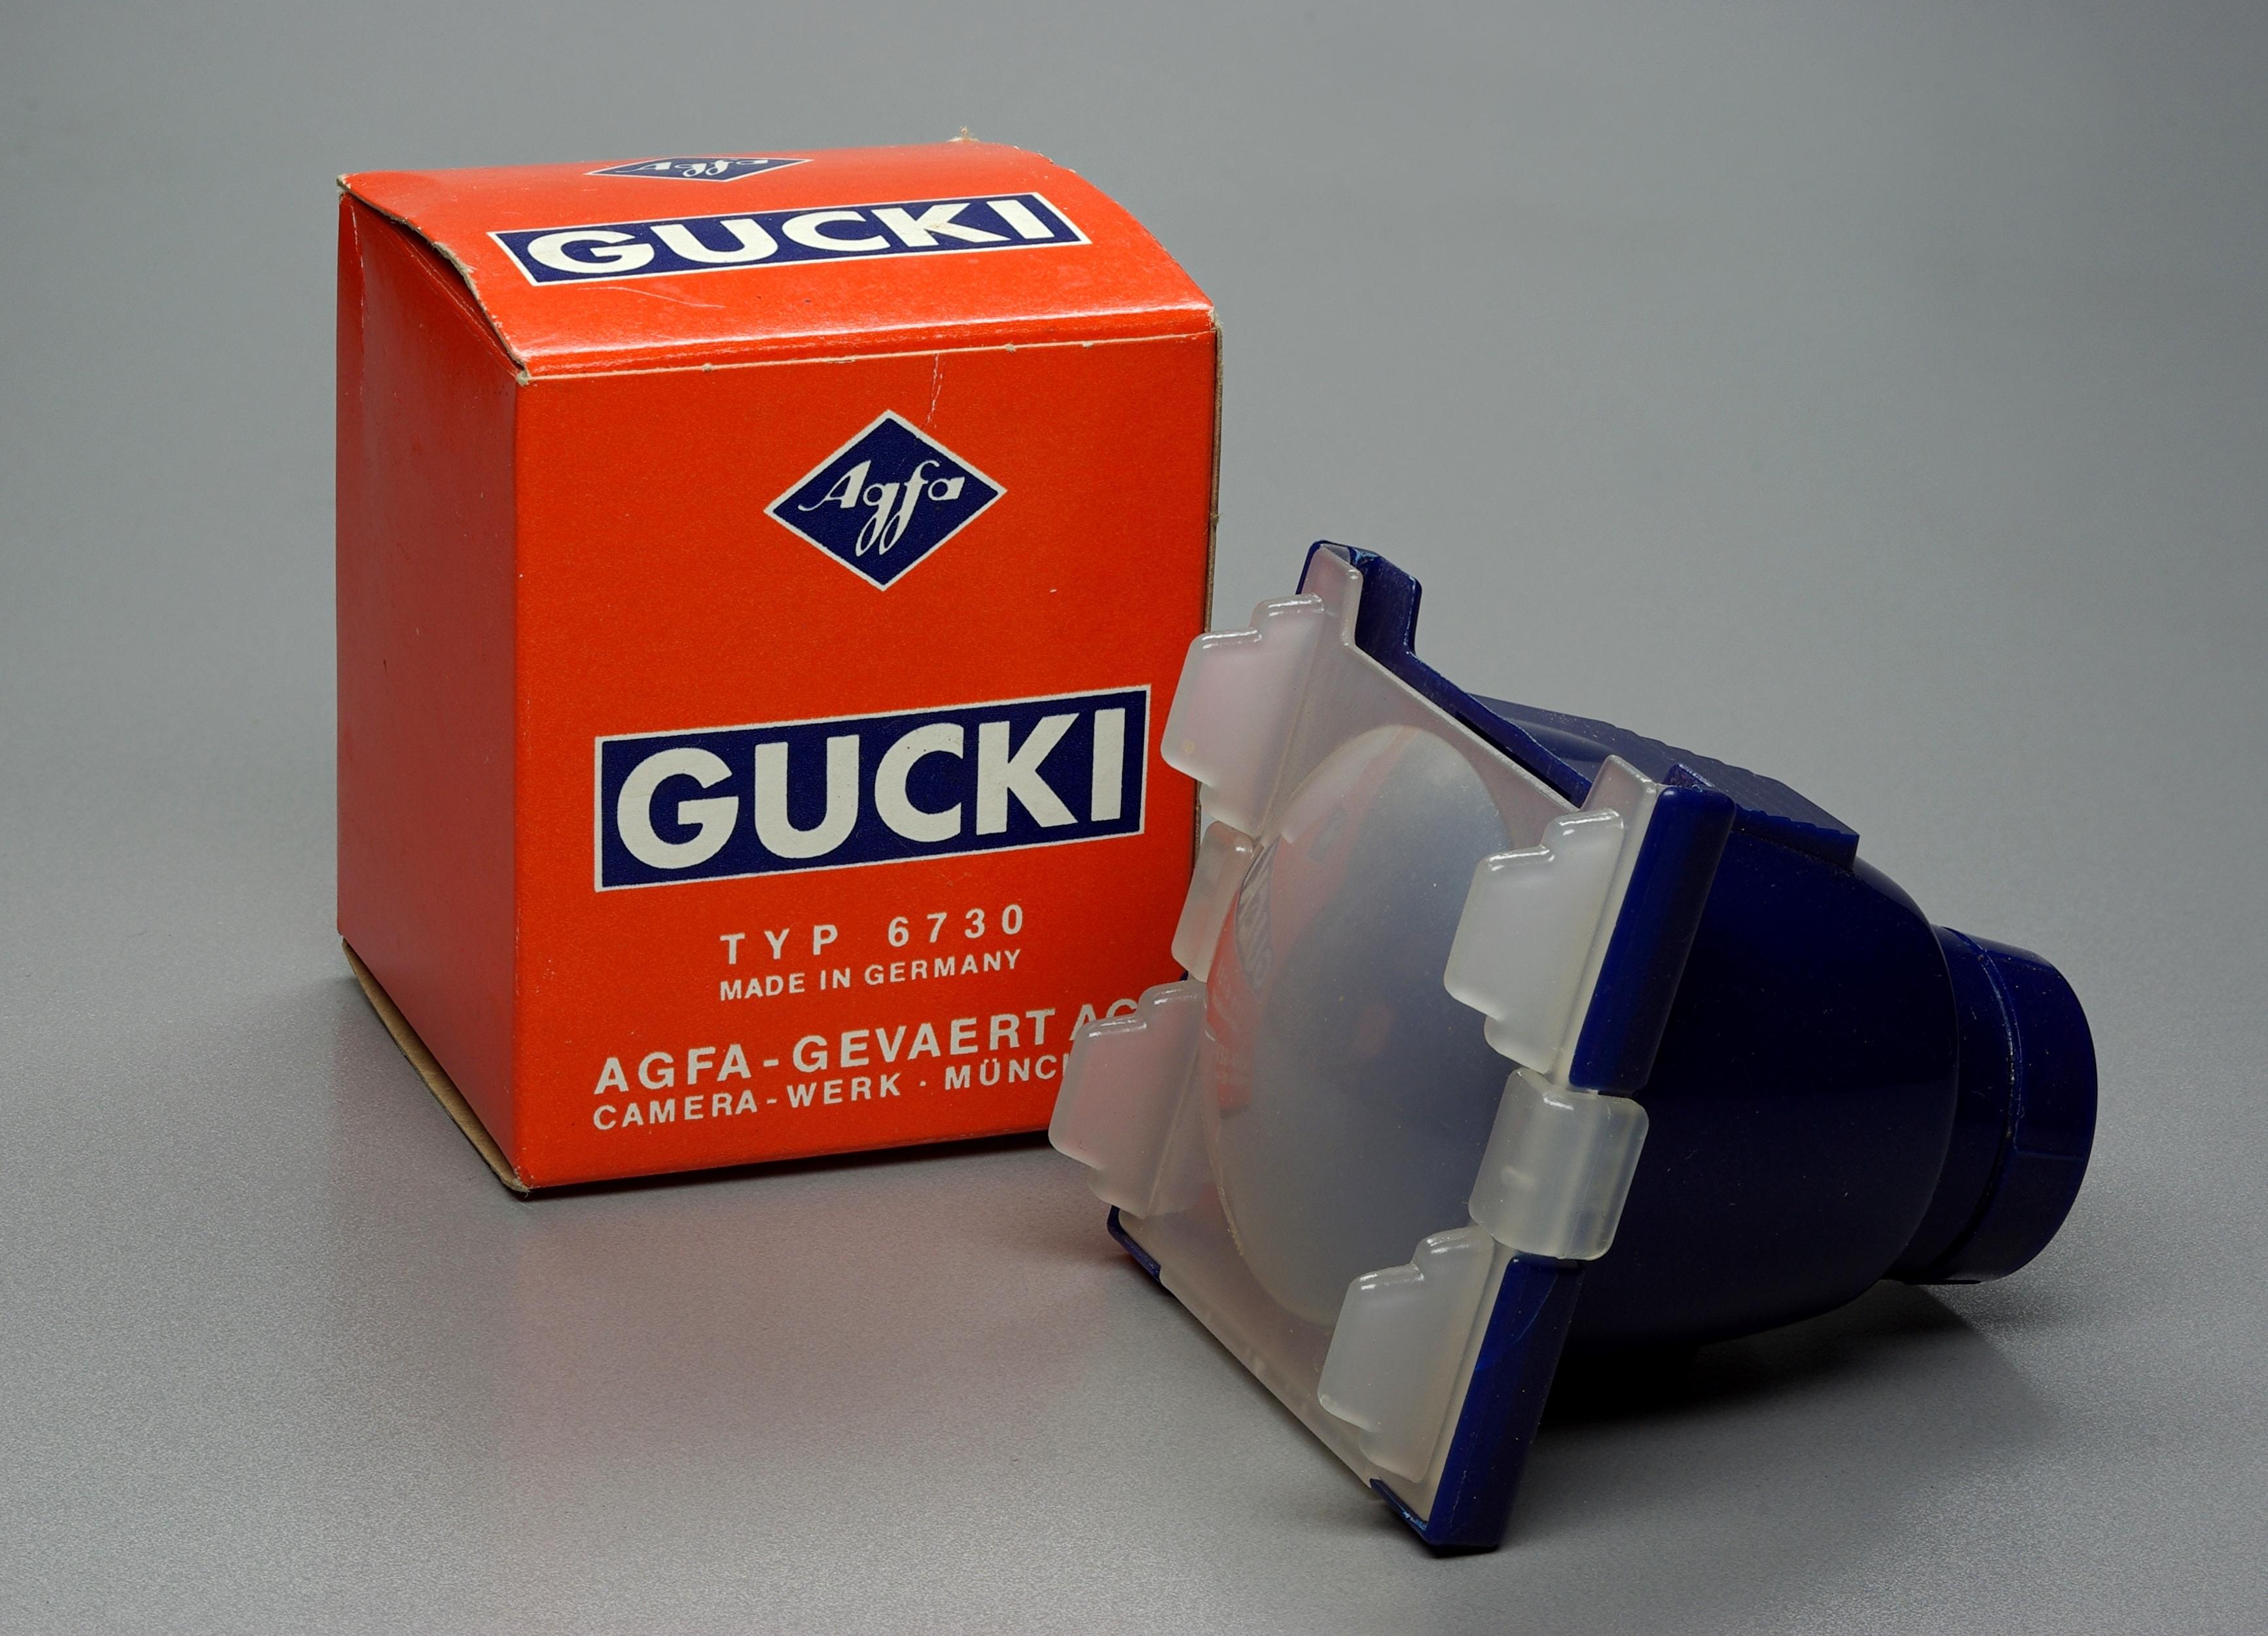 Gucki